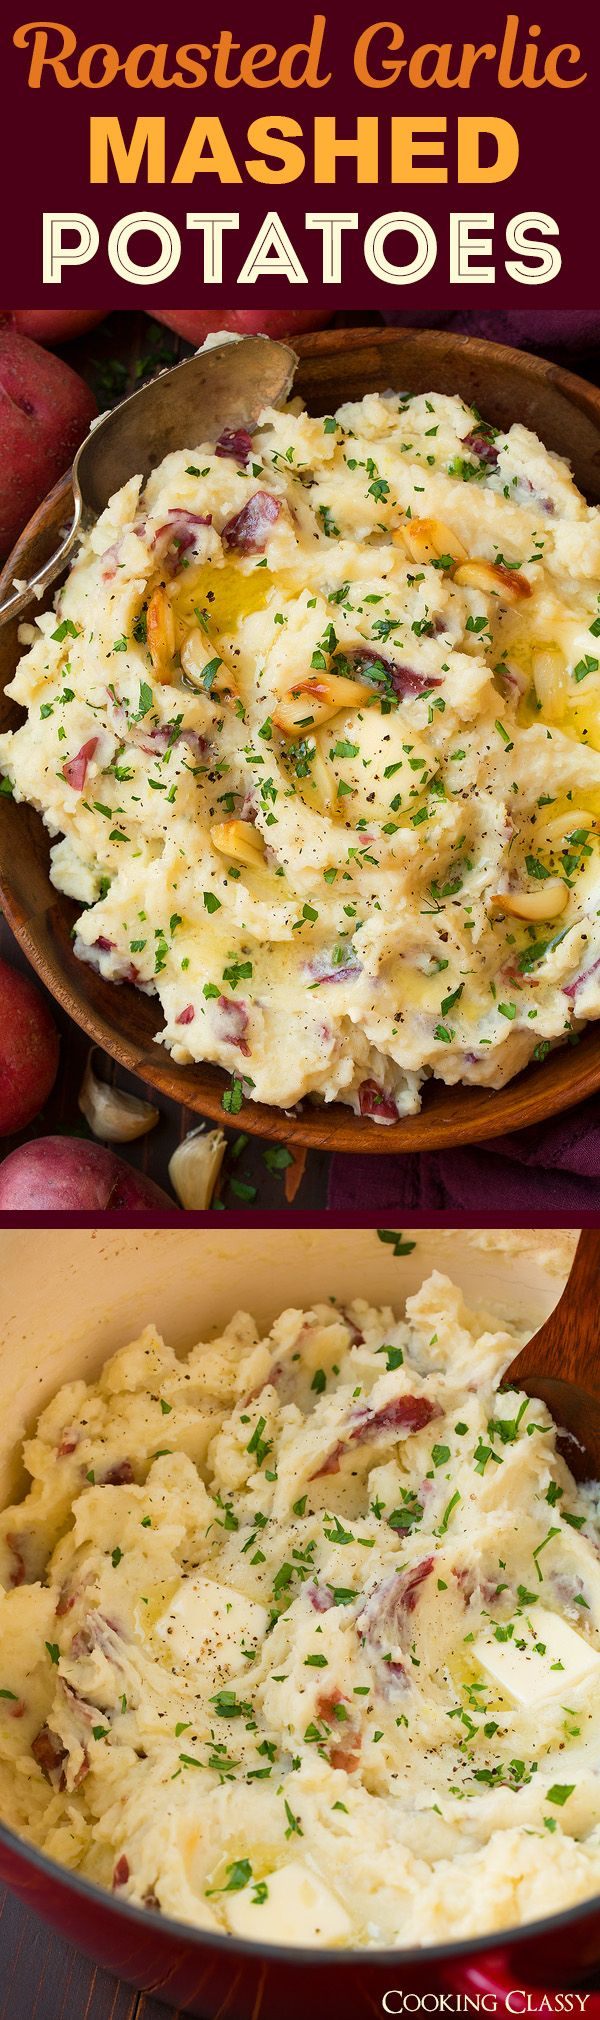 Roasted Garlic Mashed Potatoes - the ultimate comfort food! The roasted garlic makes these unbelievably good!